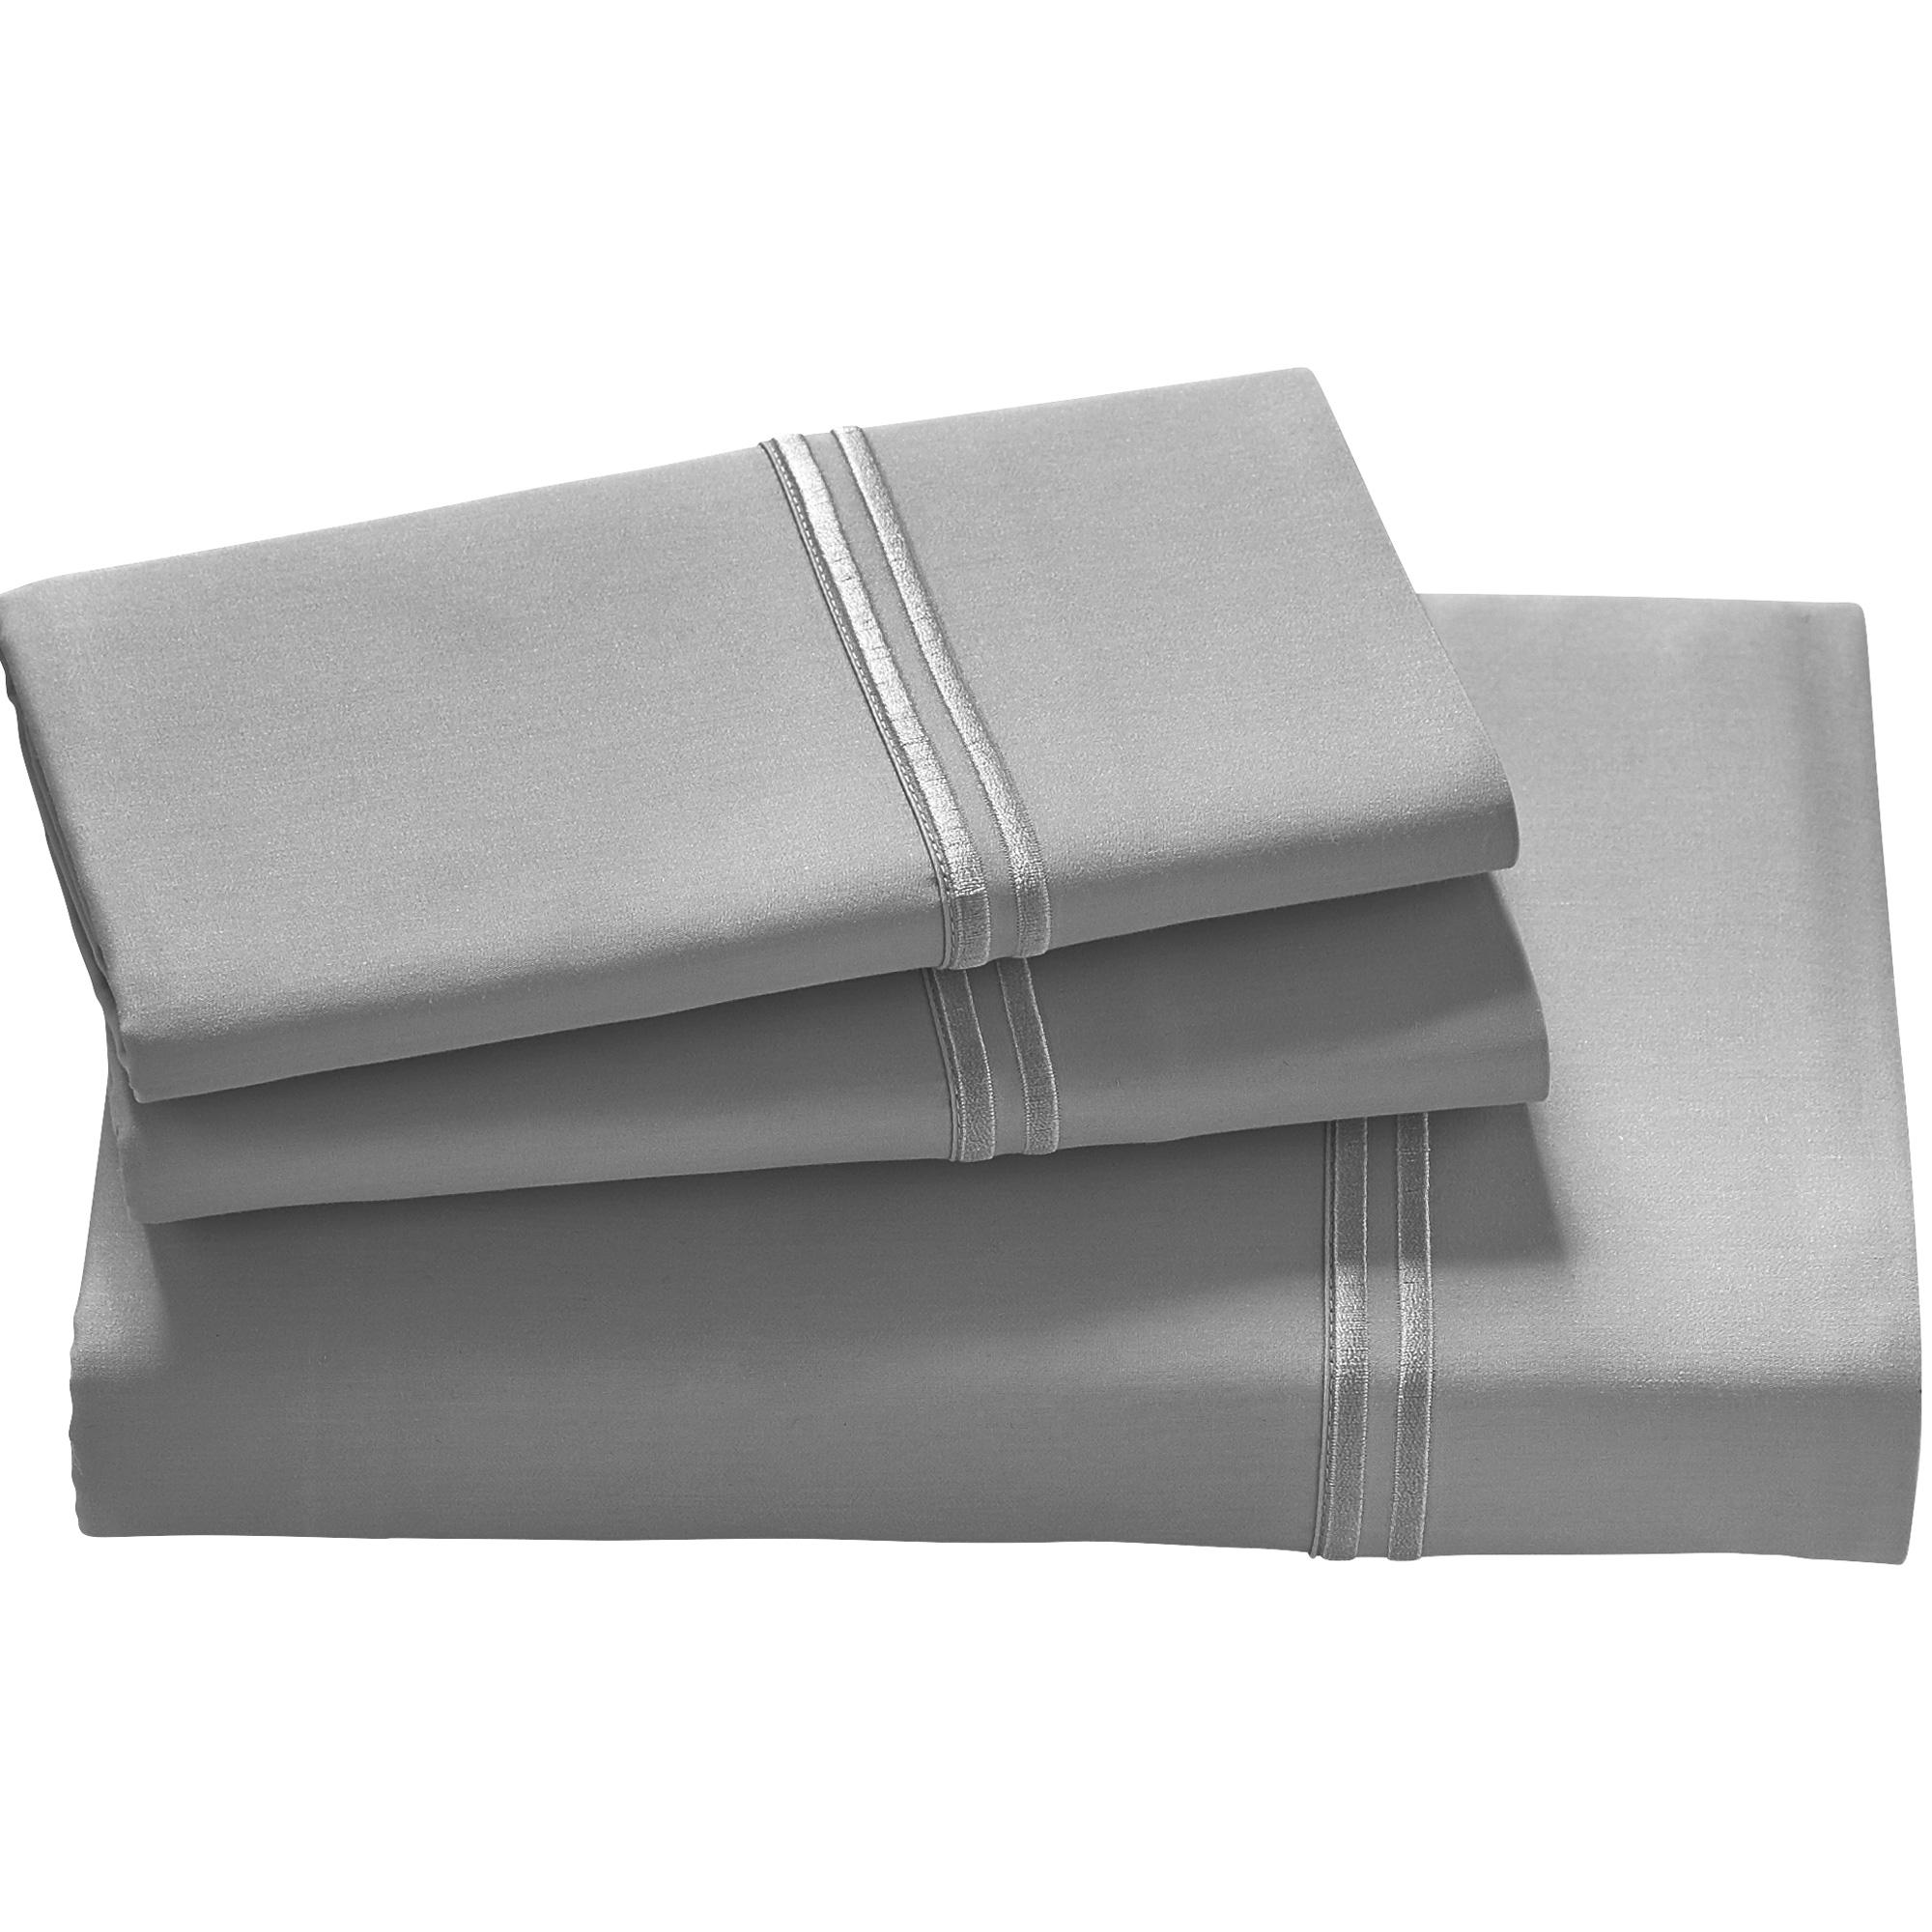 Purecare | Elements Dove Gray California King Modal Sheet Set